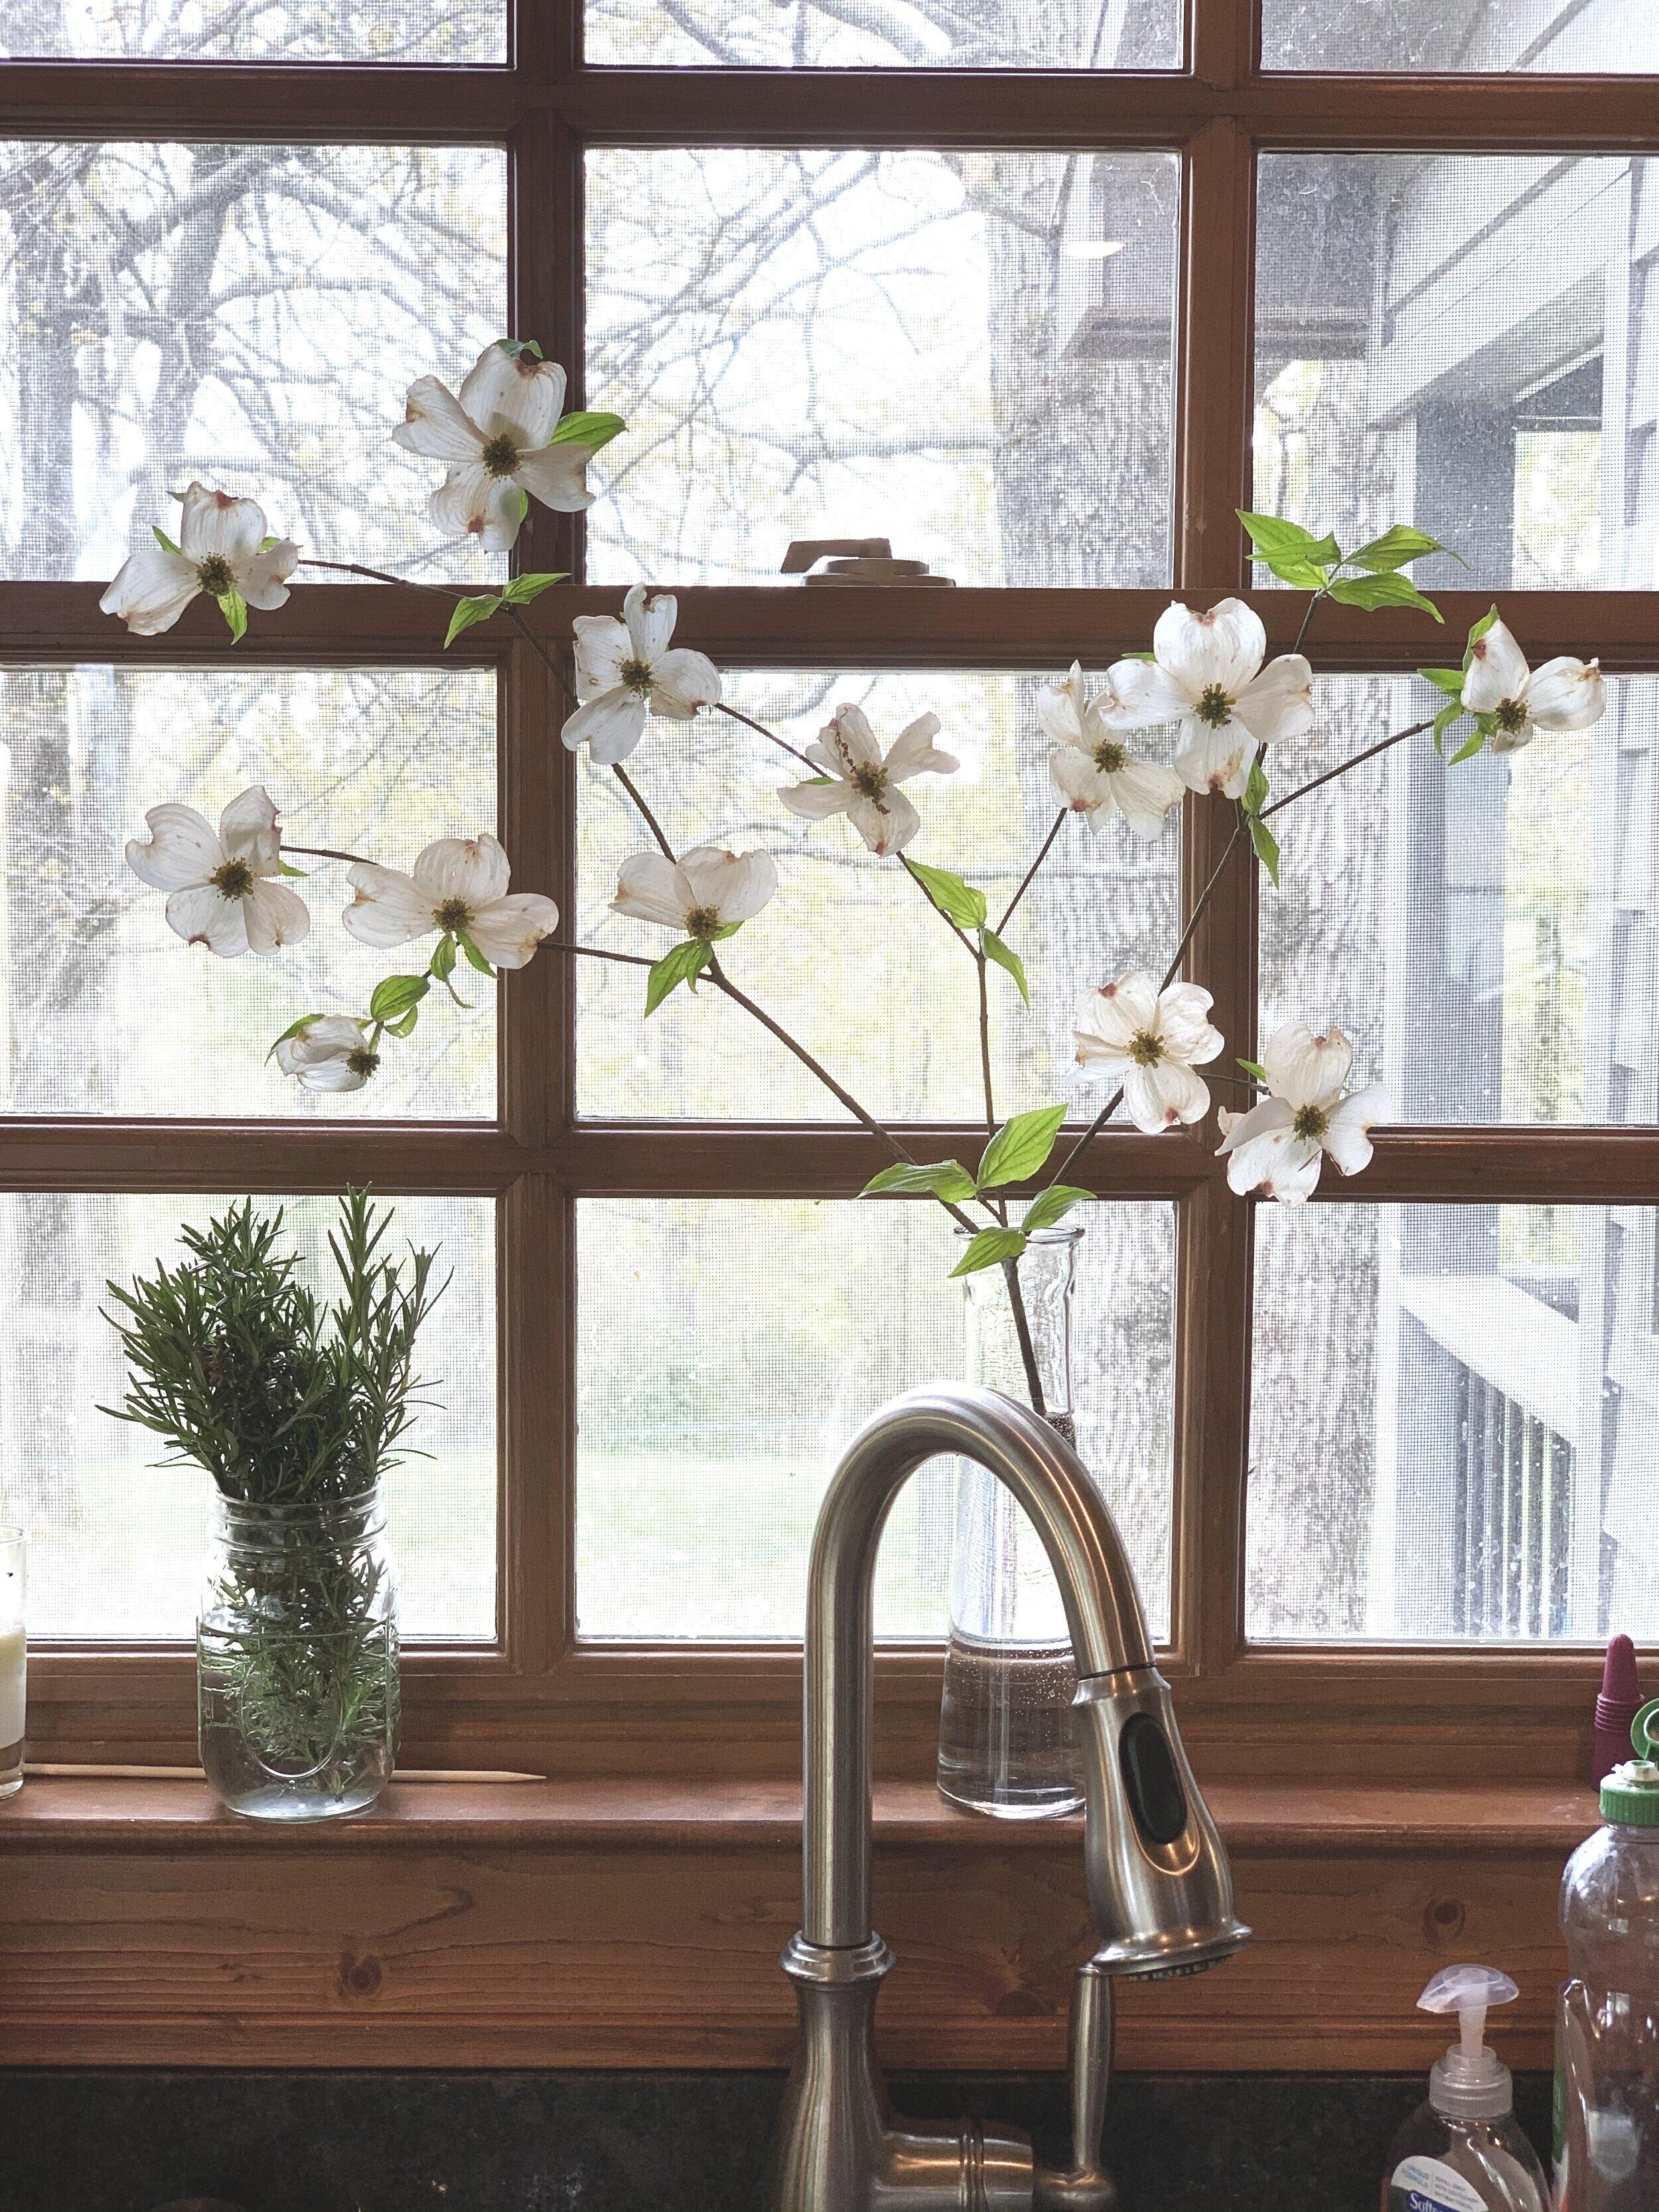 Dogwoods on the windowsill to welcome Springtime.